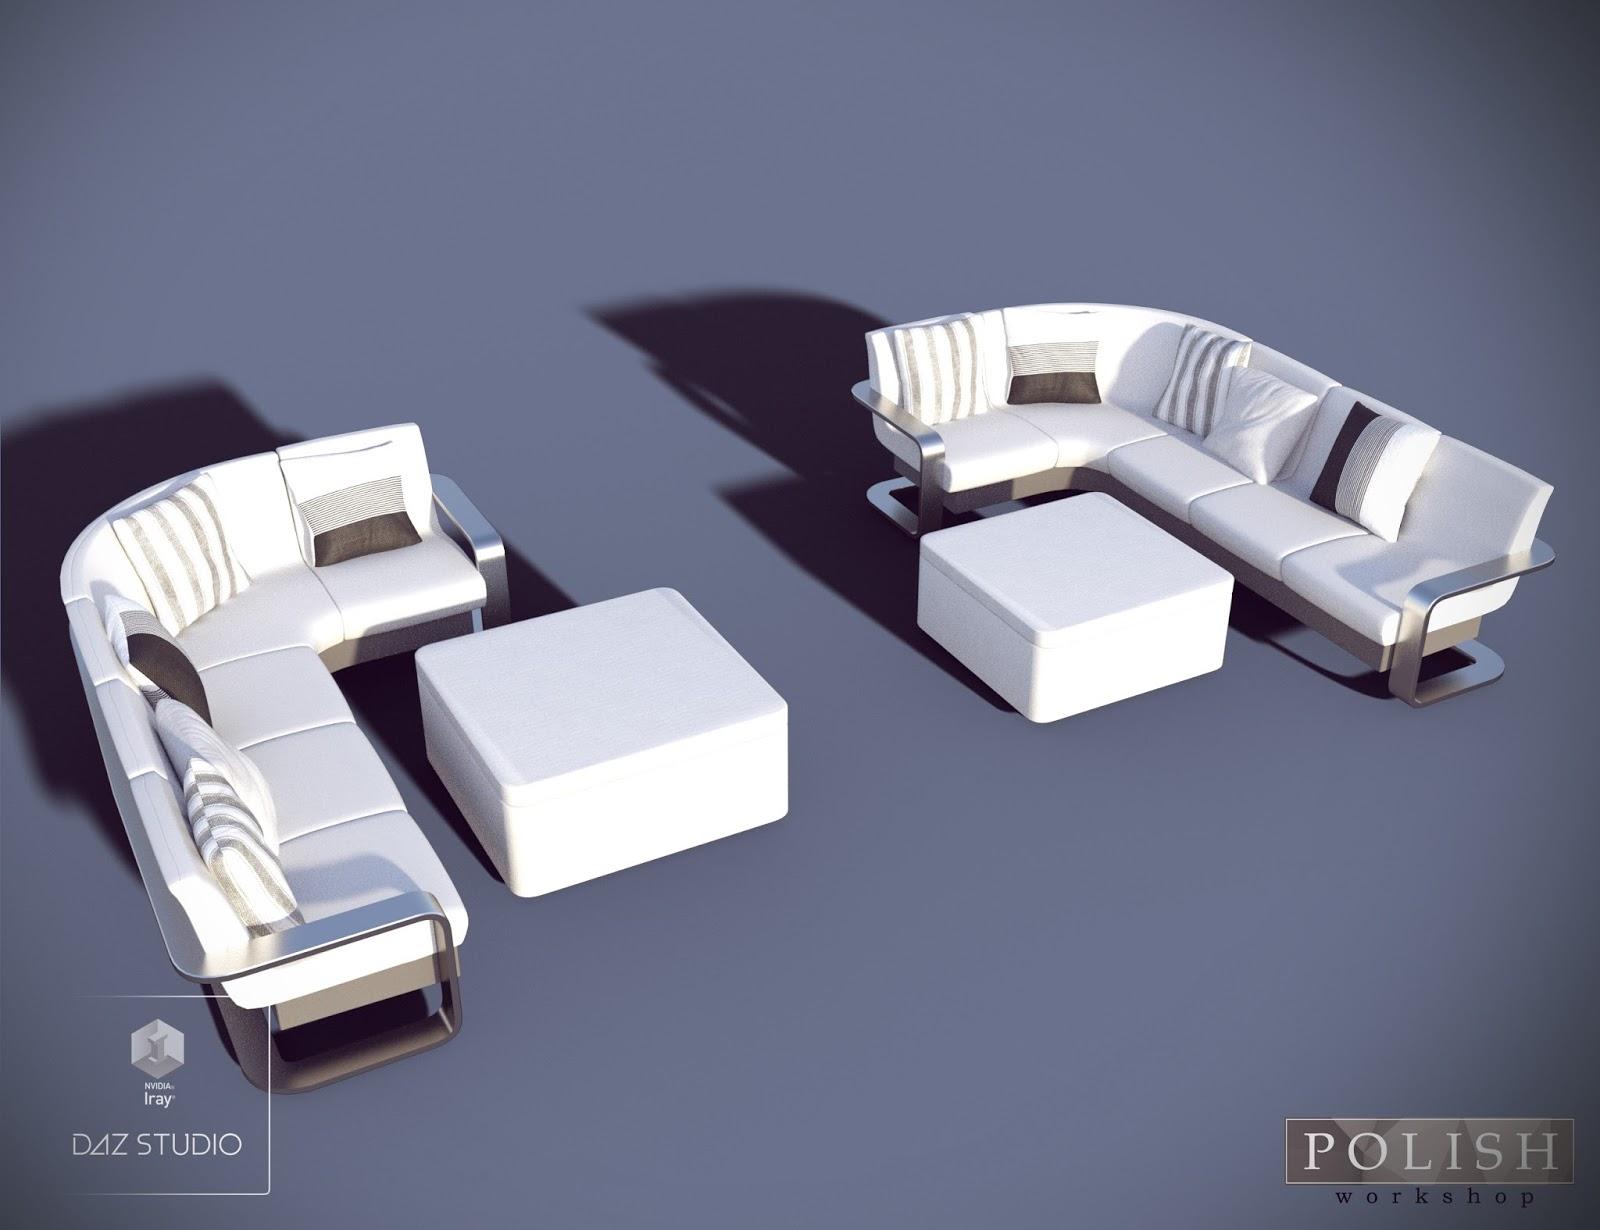 Download DAZ Studio 3 for FREE DAZ 3D Luxury Summer  : 01 luxury summer yacht props daz3d from 3d-art-mary.blogspot.com size 1600 x 1230 jpeg 152kB